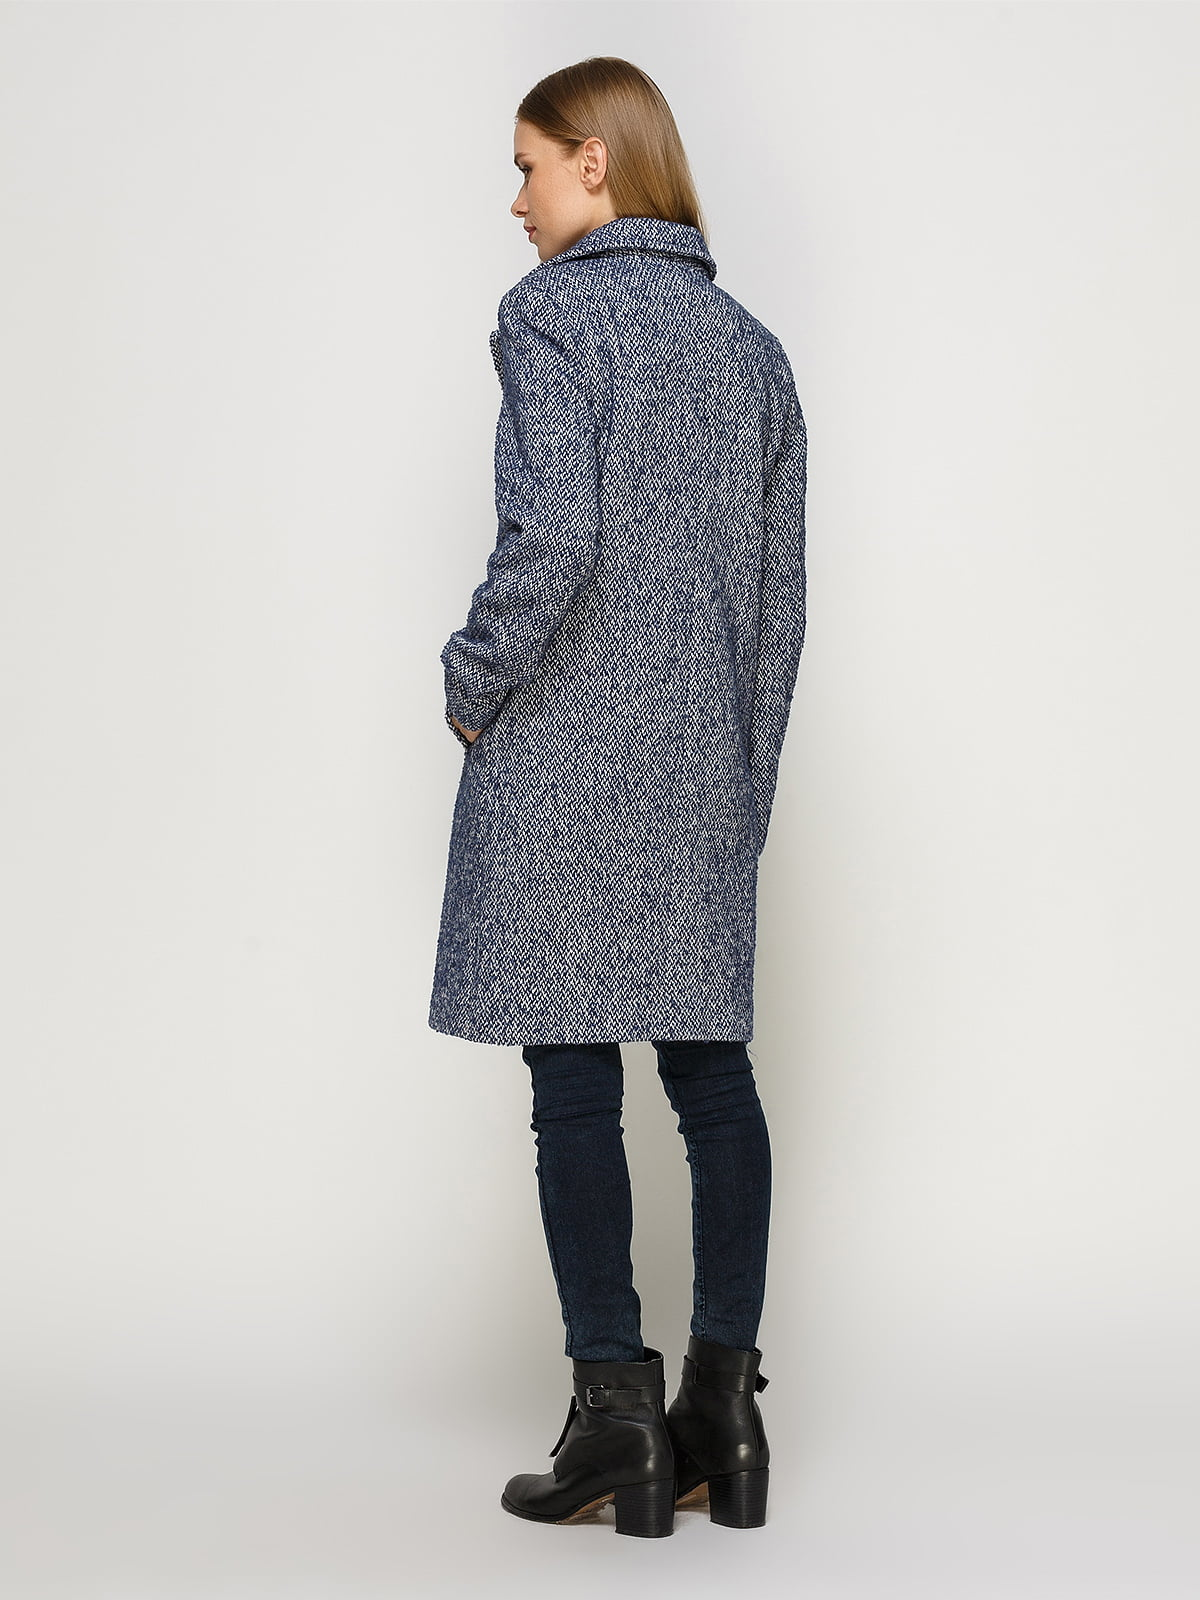 Пальто светло-синее | 4492631 | фото 3